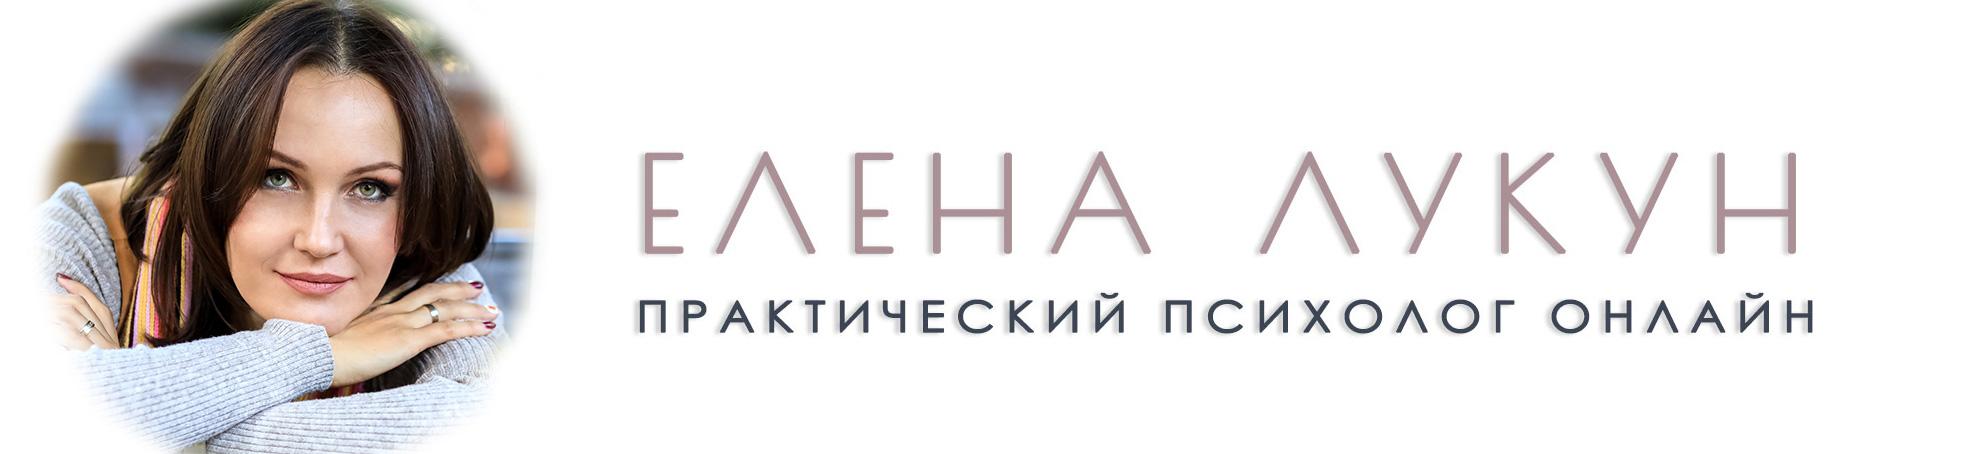 Психолог в Ташкенте Елена Лукун